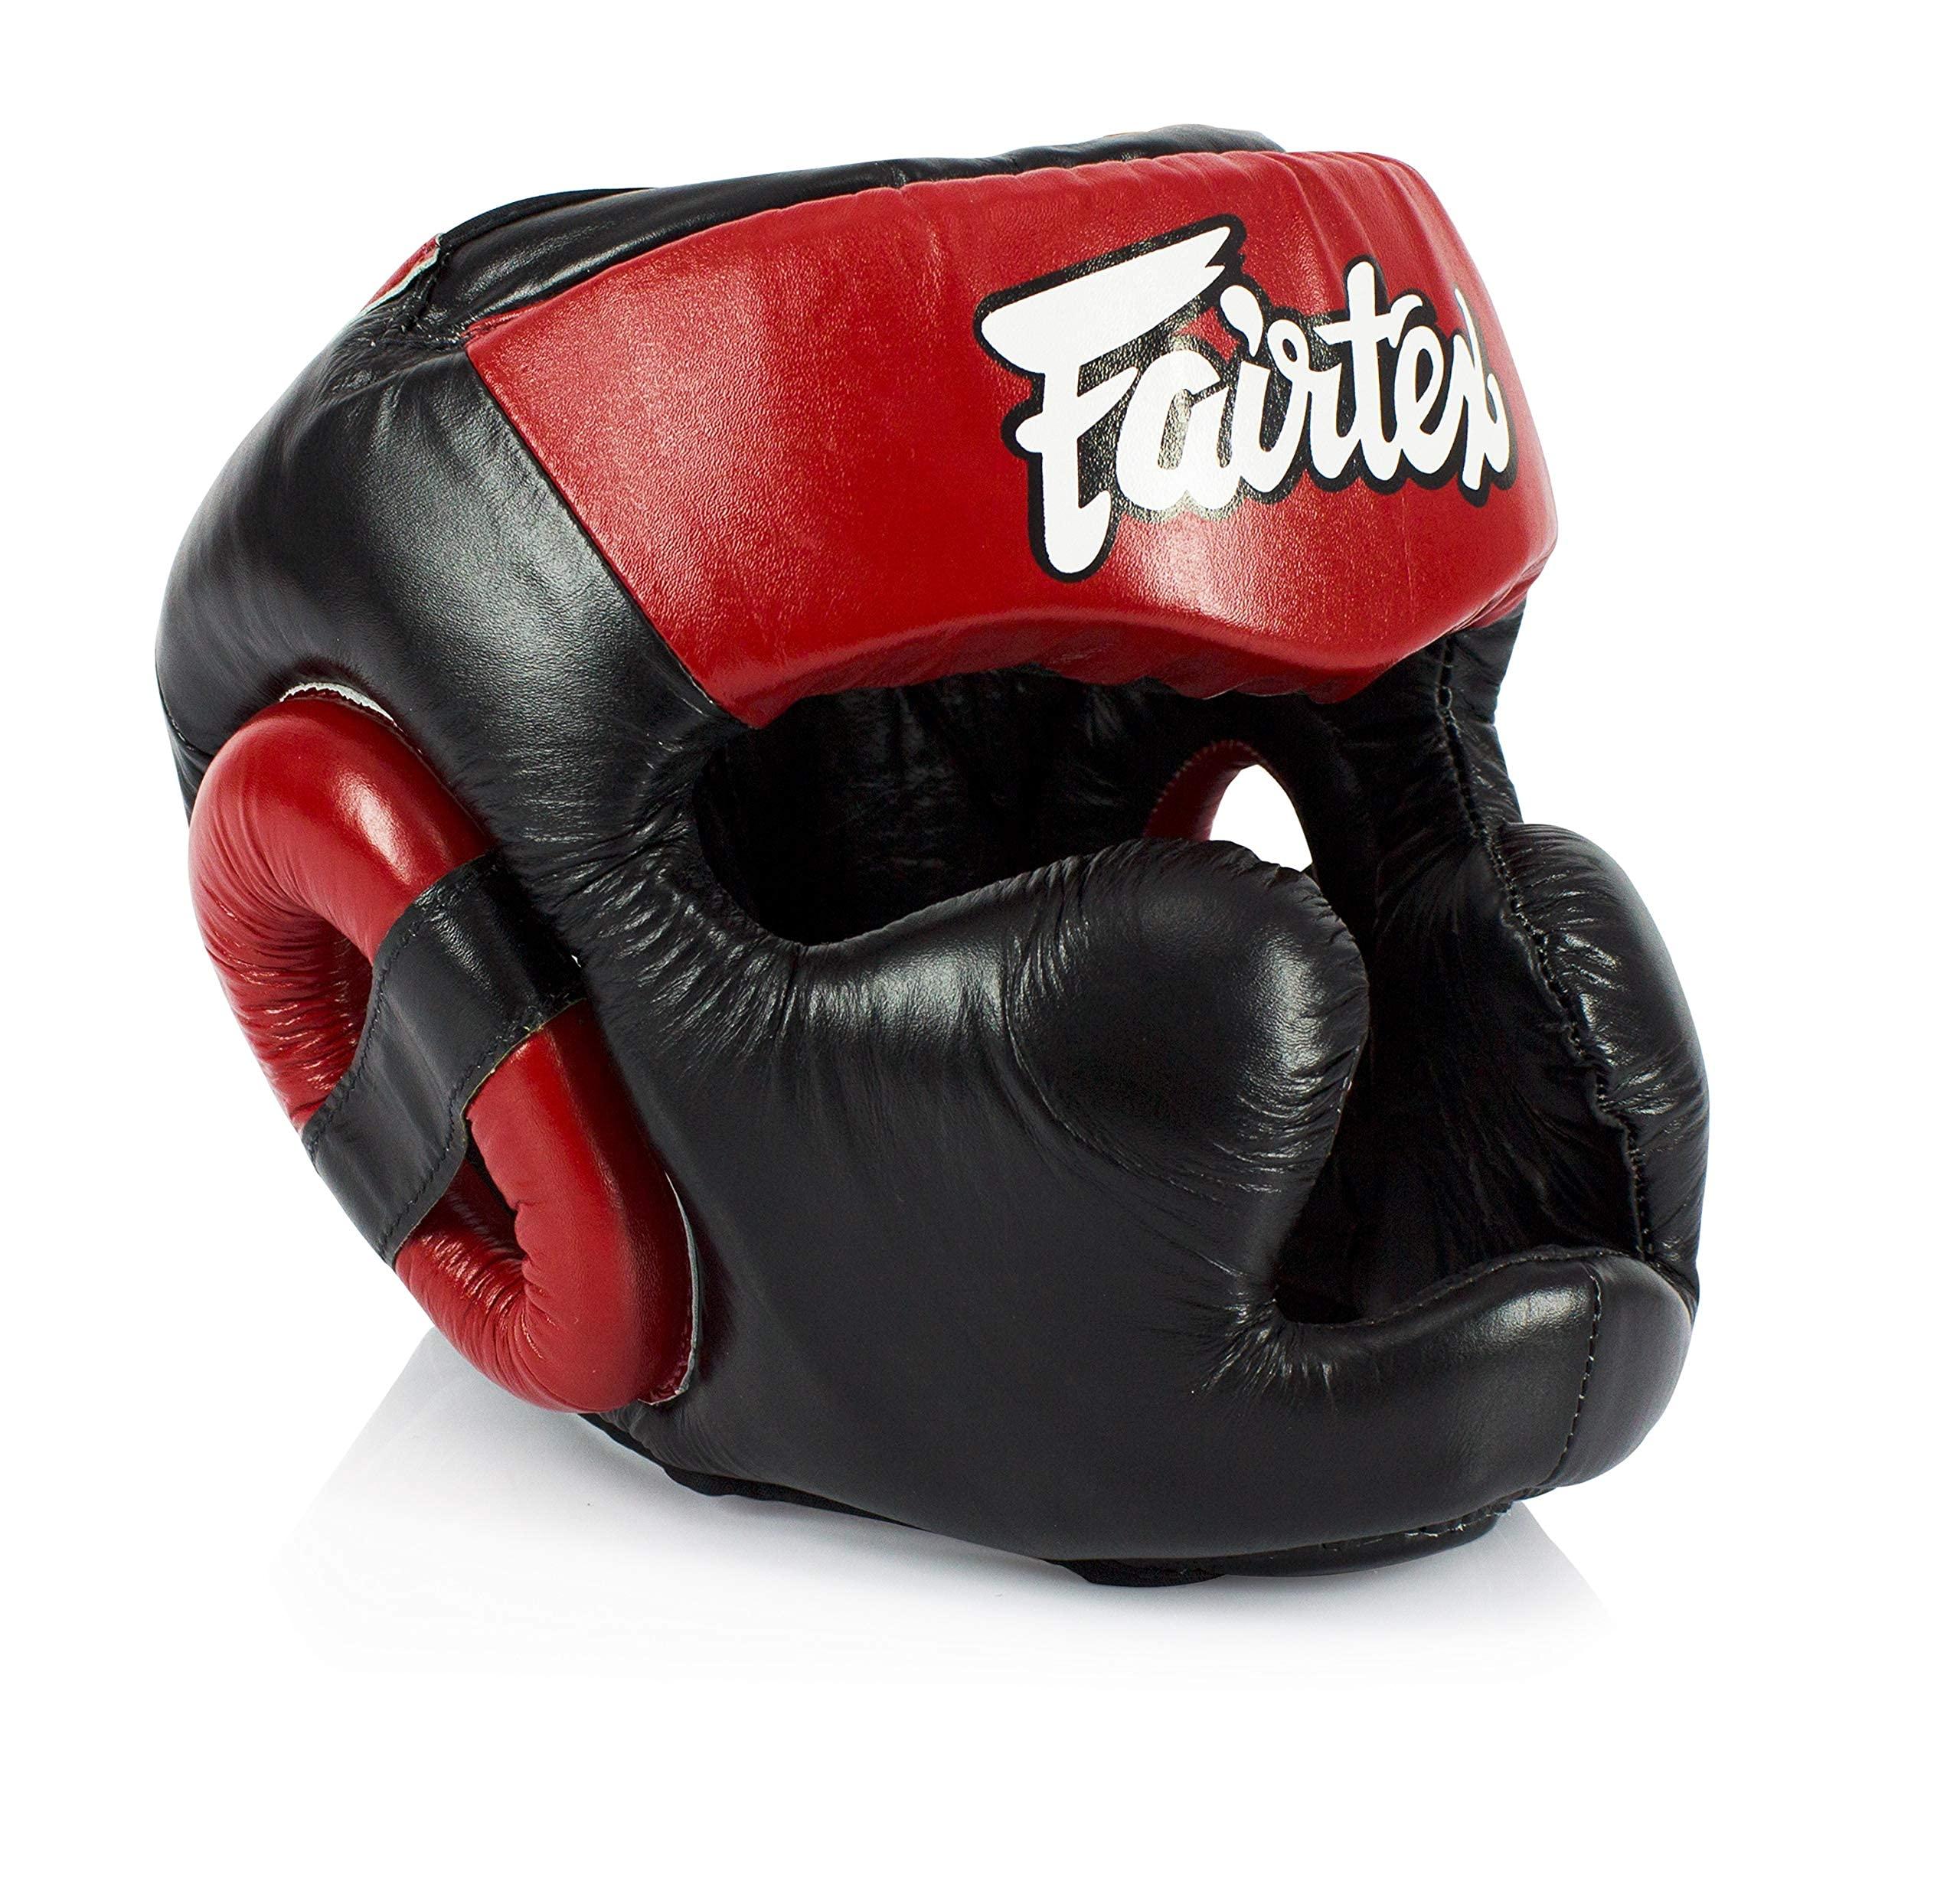 FAIRTEX HG13 MUAY THAI HEADGEAR HEADGUARD BOXING MMA SPARRING FULL KICKBOXING